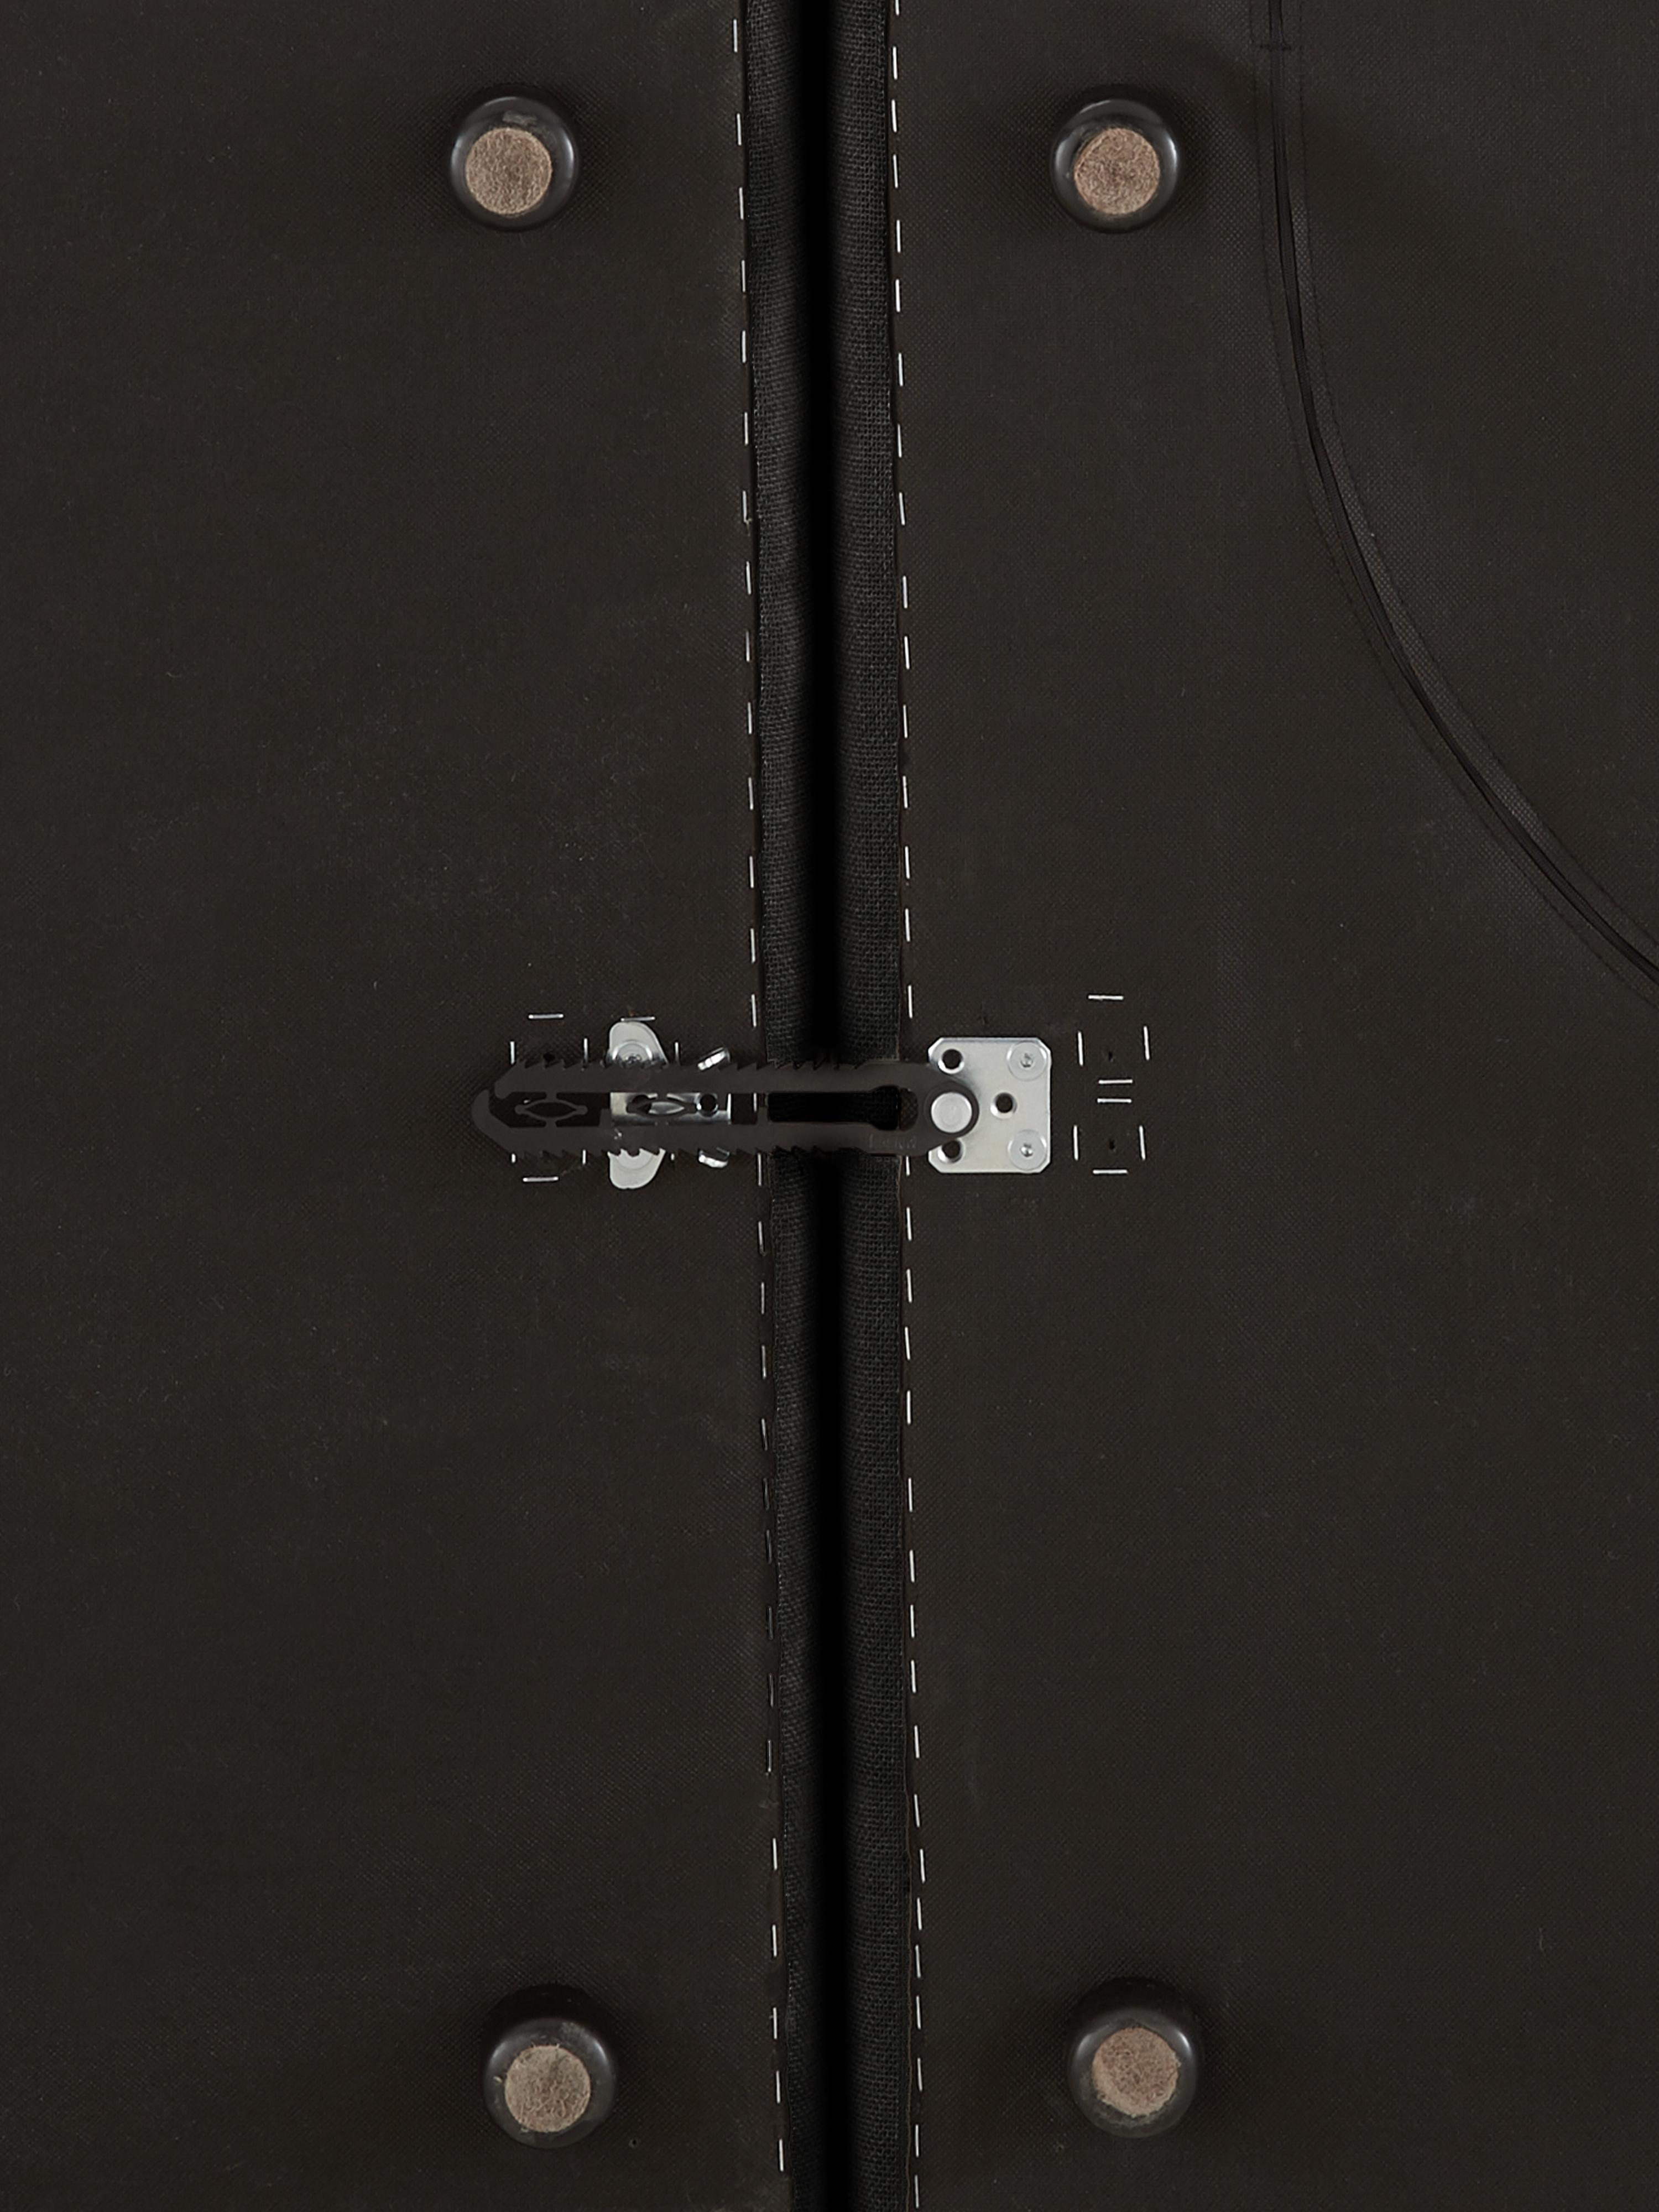 Modulares Ecksofa Lennon, Bezug: Polyester Der hochwertige, Gestell: Massives Kiefernholz, Spe, Füße: Kunststoff, Webstoff Anthrazit, B 326 x T 207 cm